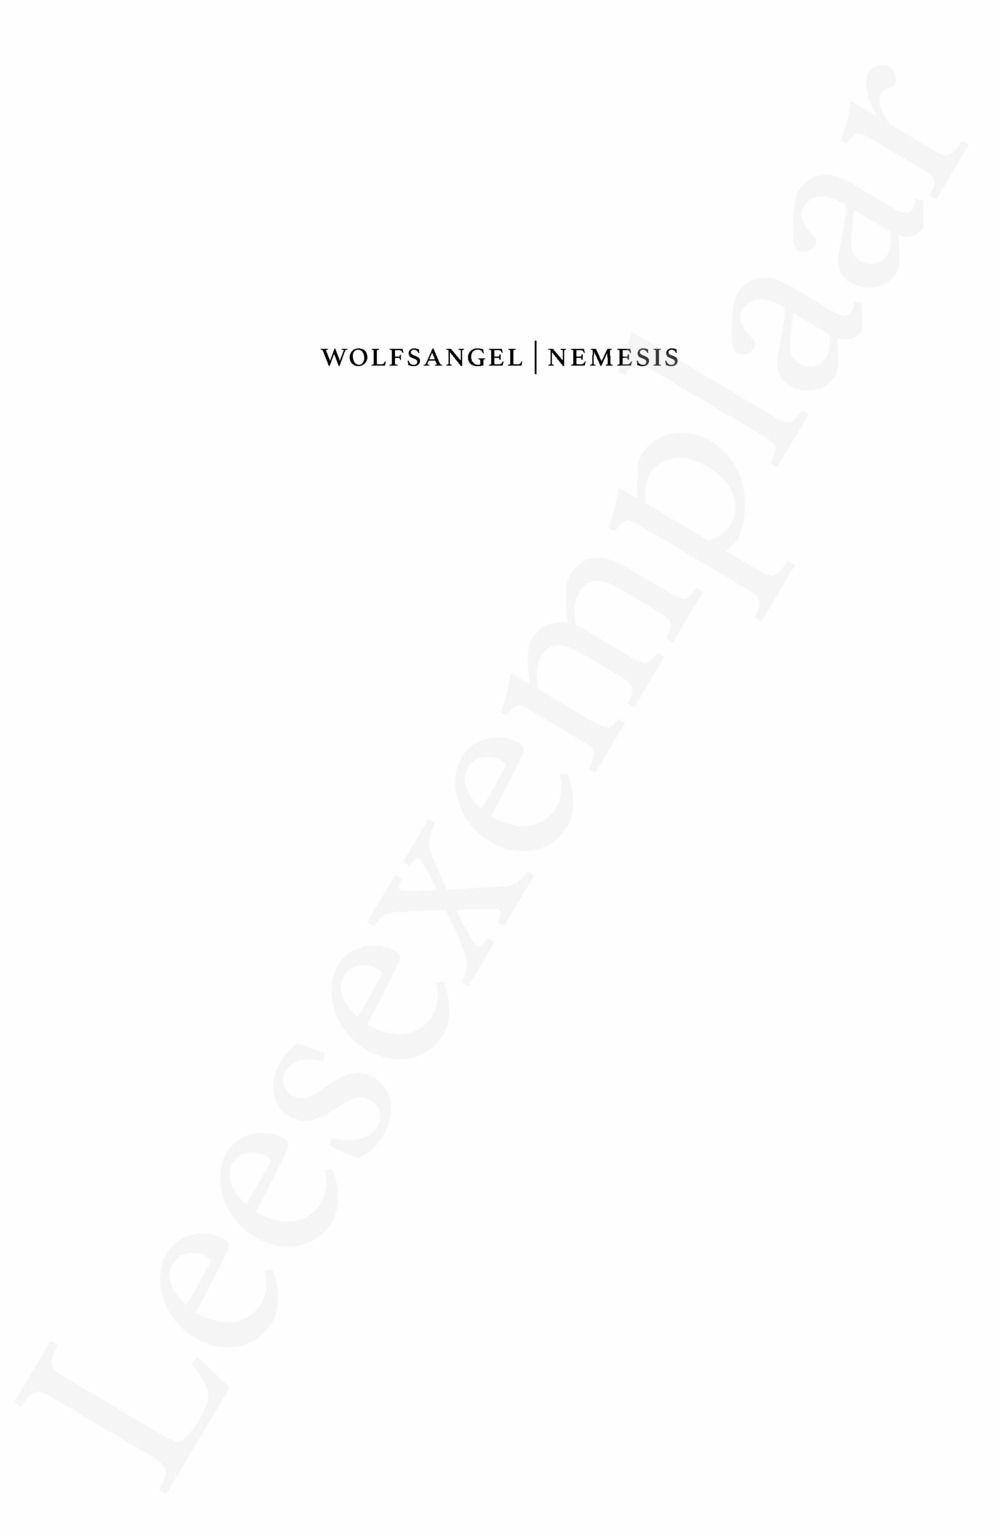 Preview: Wolfsangel: Nemesis